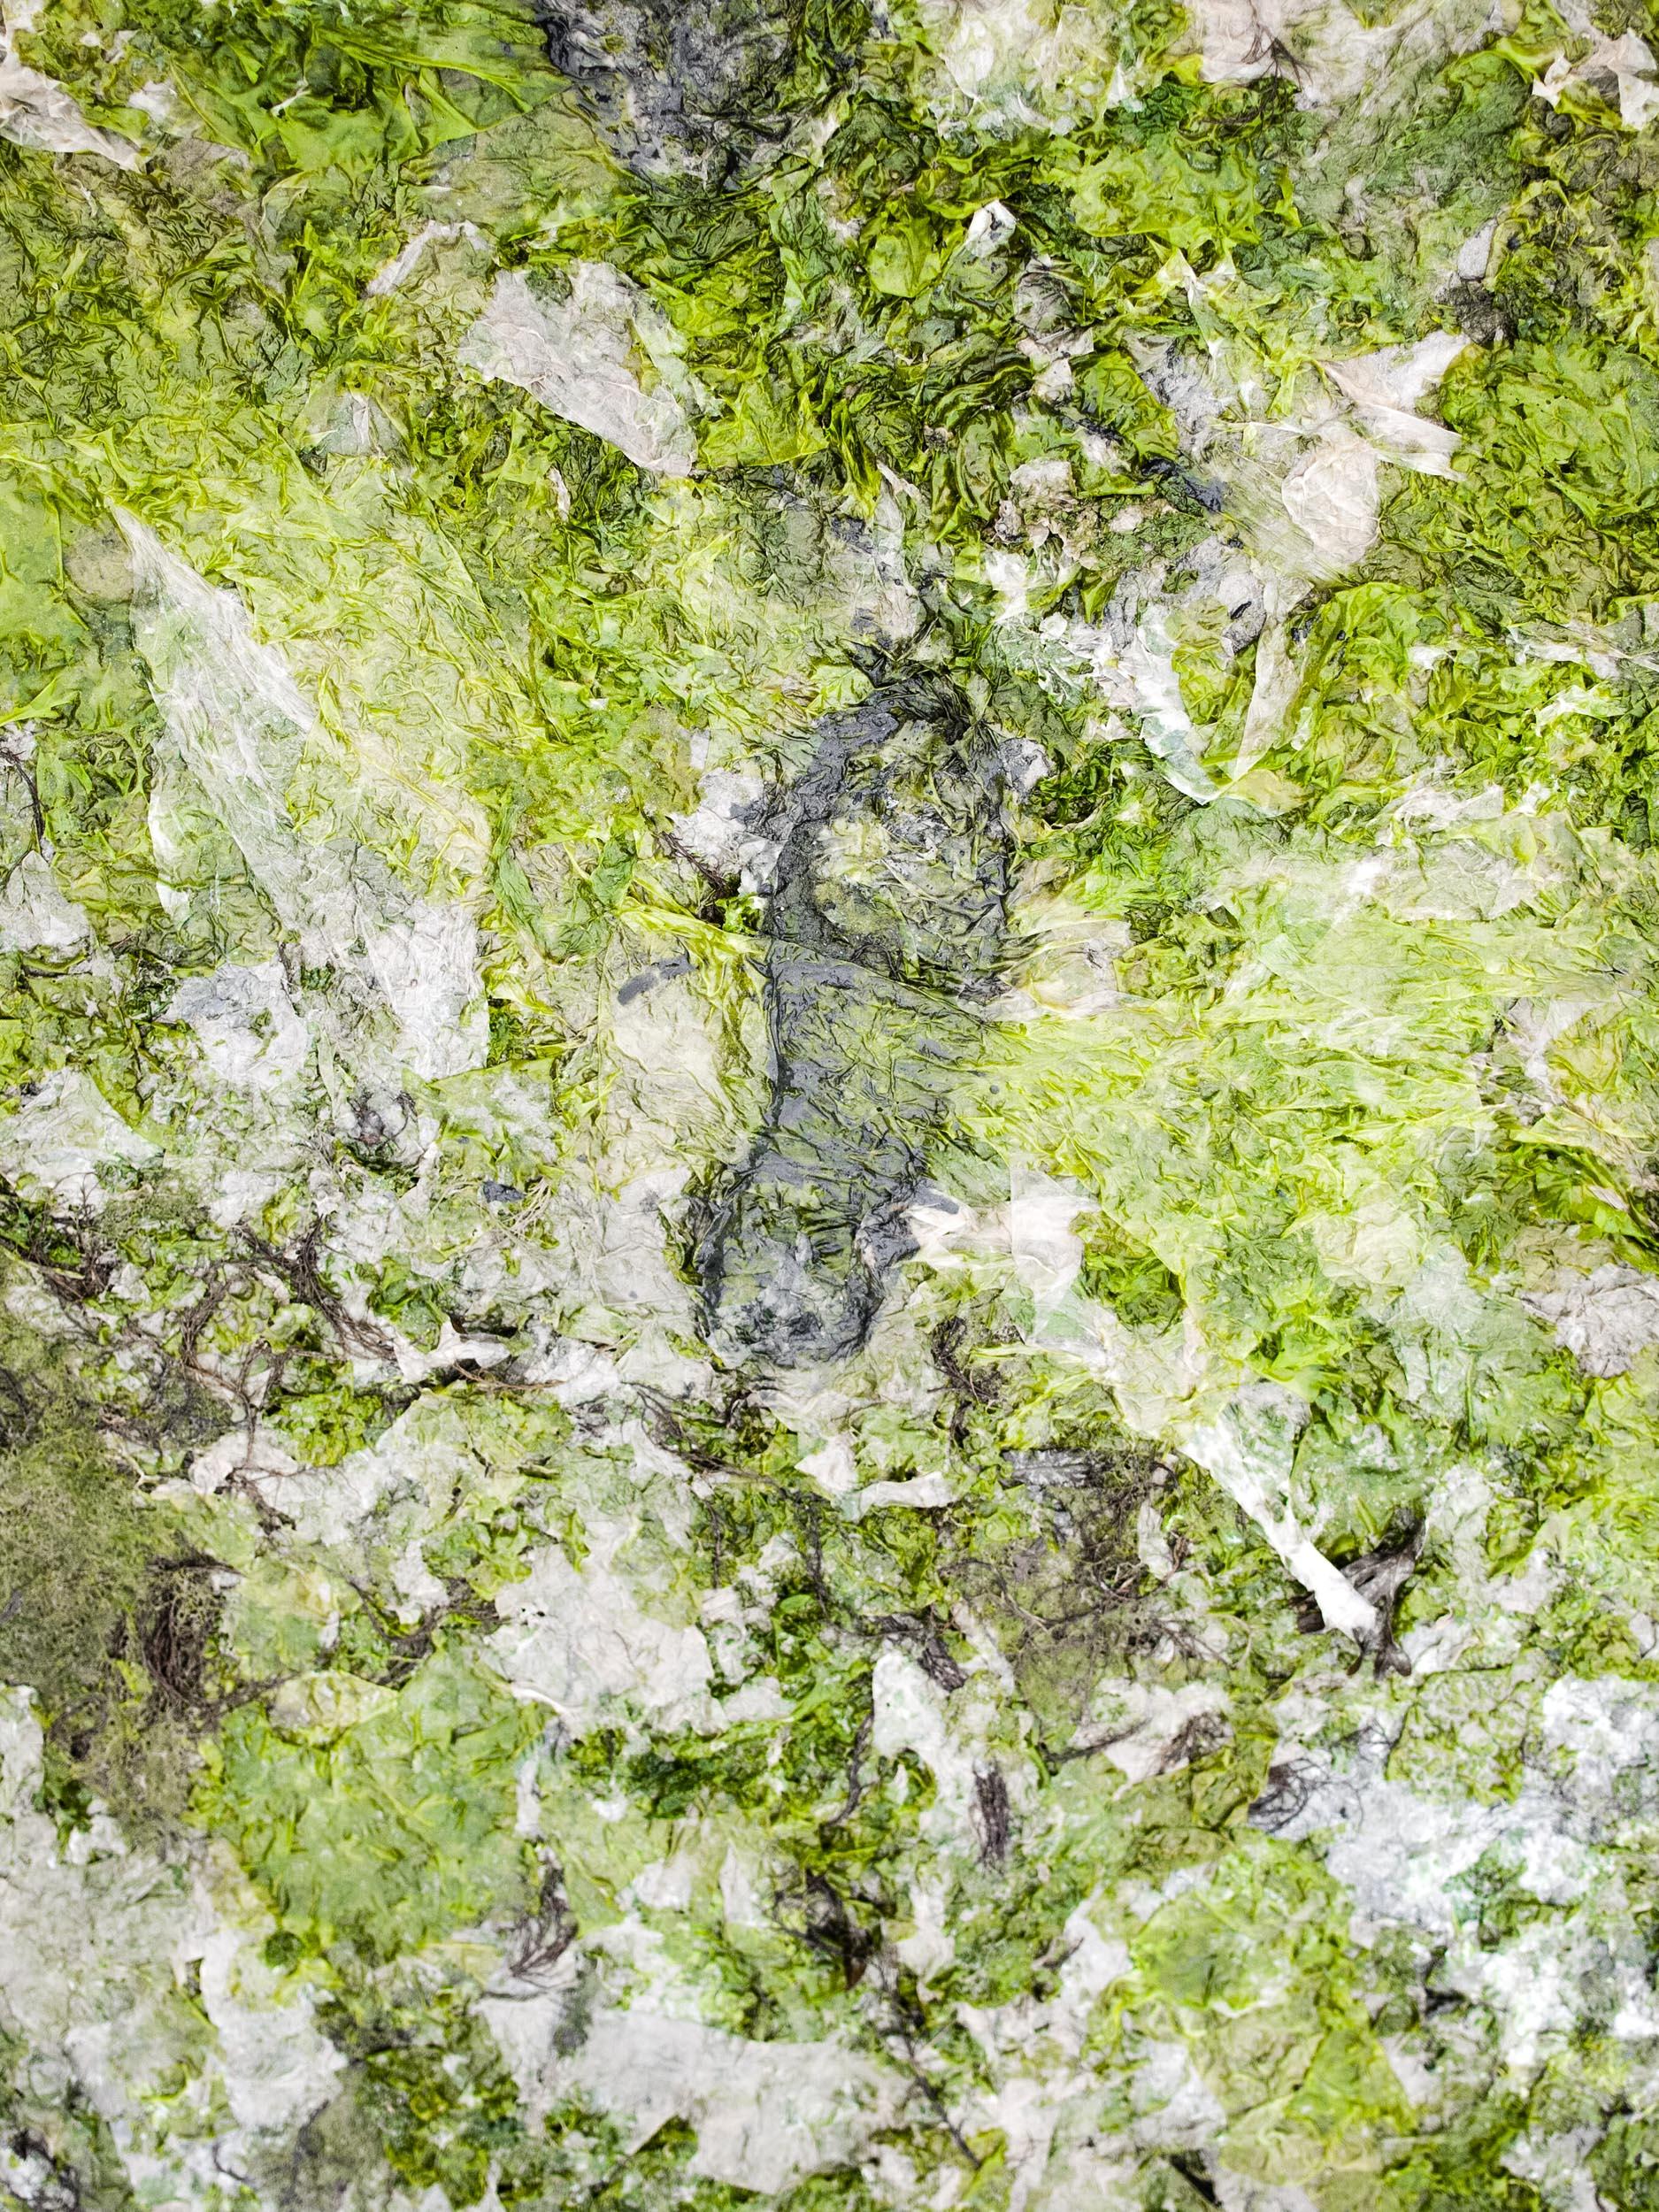 46-TERRES-BRULEES©AUGUSTIN-LE_GALL-15-2017-ALG-marees-vertes-bretagne©AUGUSTIN-LEGALL-IMG_2609.jpg